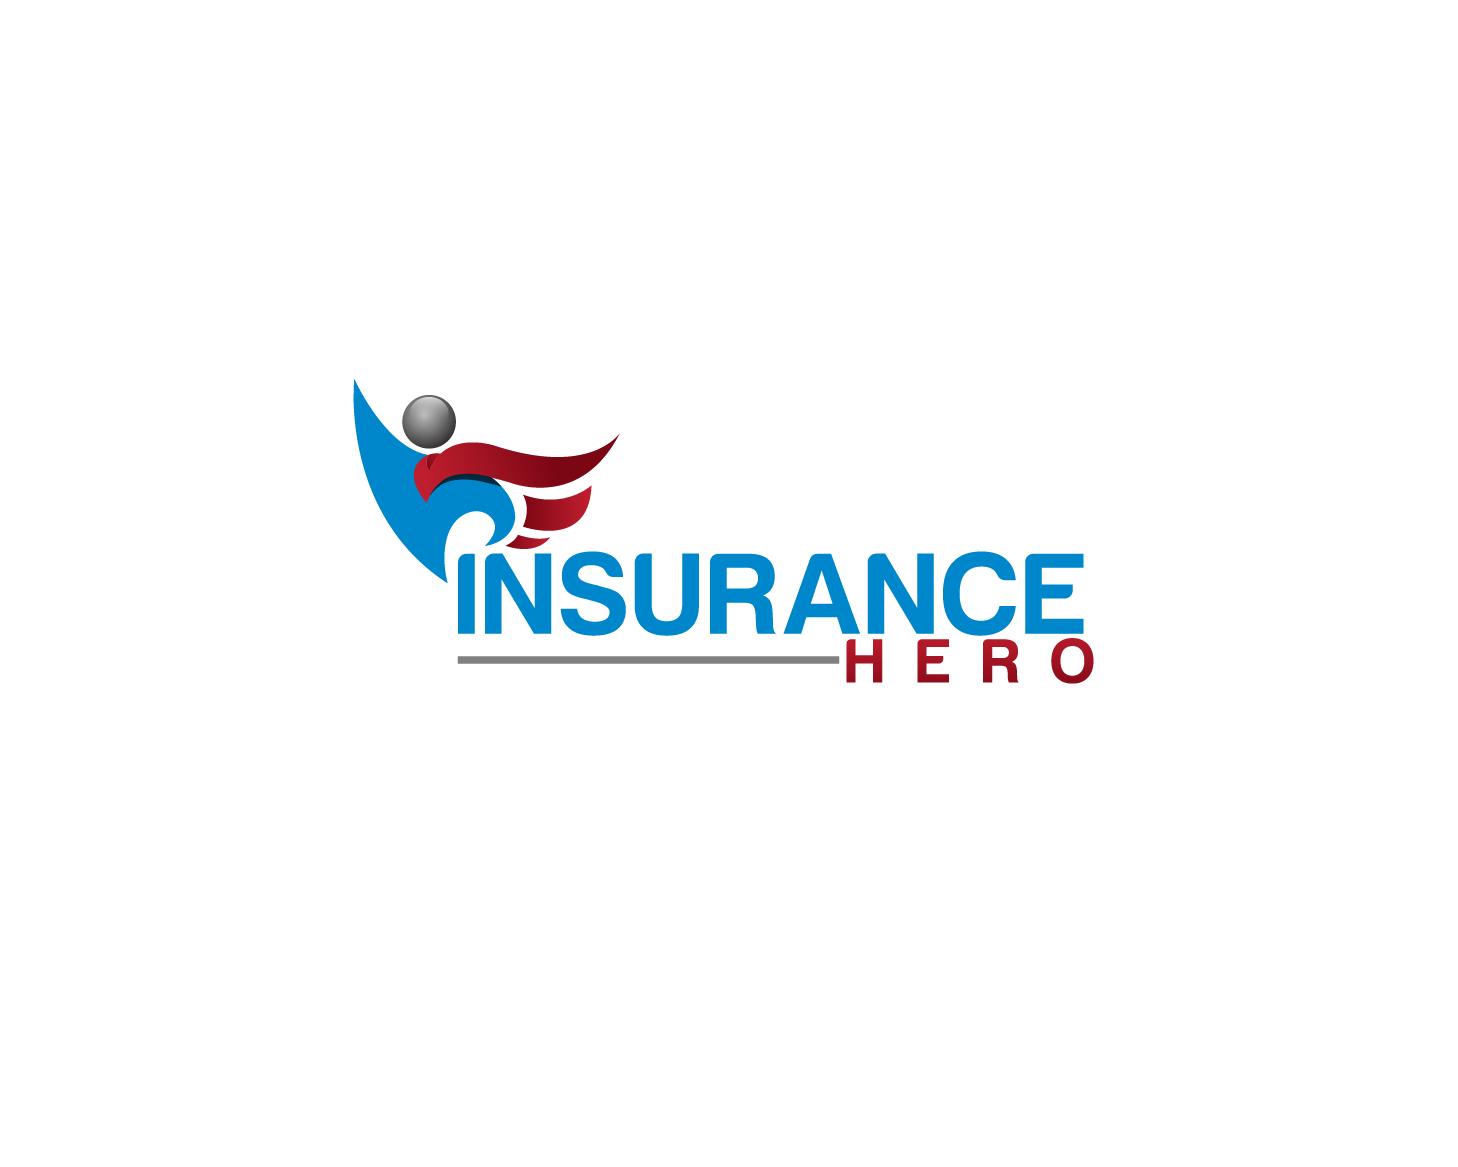 Logo for Online Insurance Agency by Jayroc4